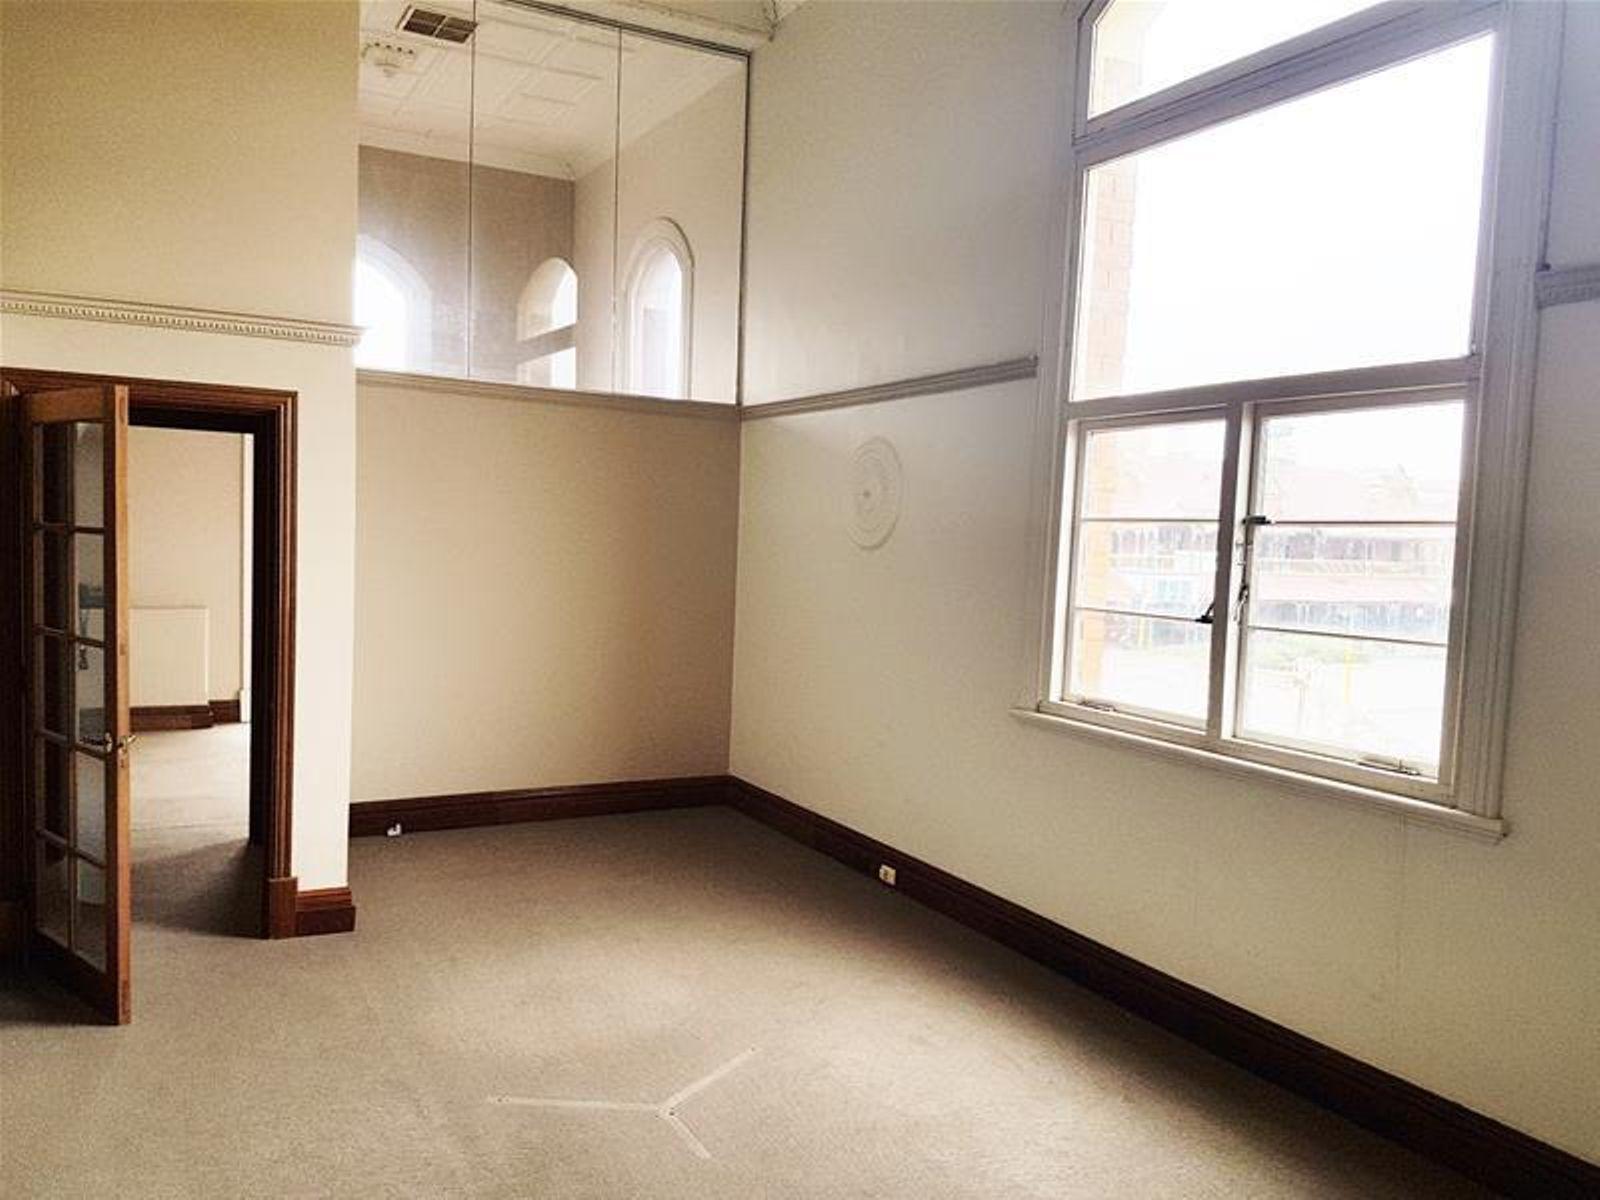 Suite F2/140 - 144 Hannan Street, Kalgoorlie, WA 6430